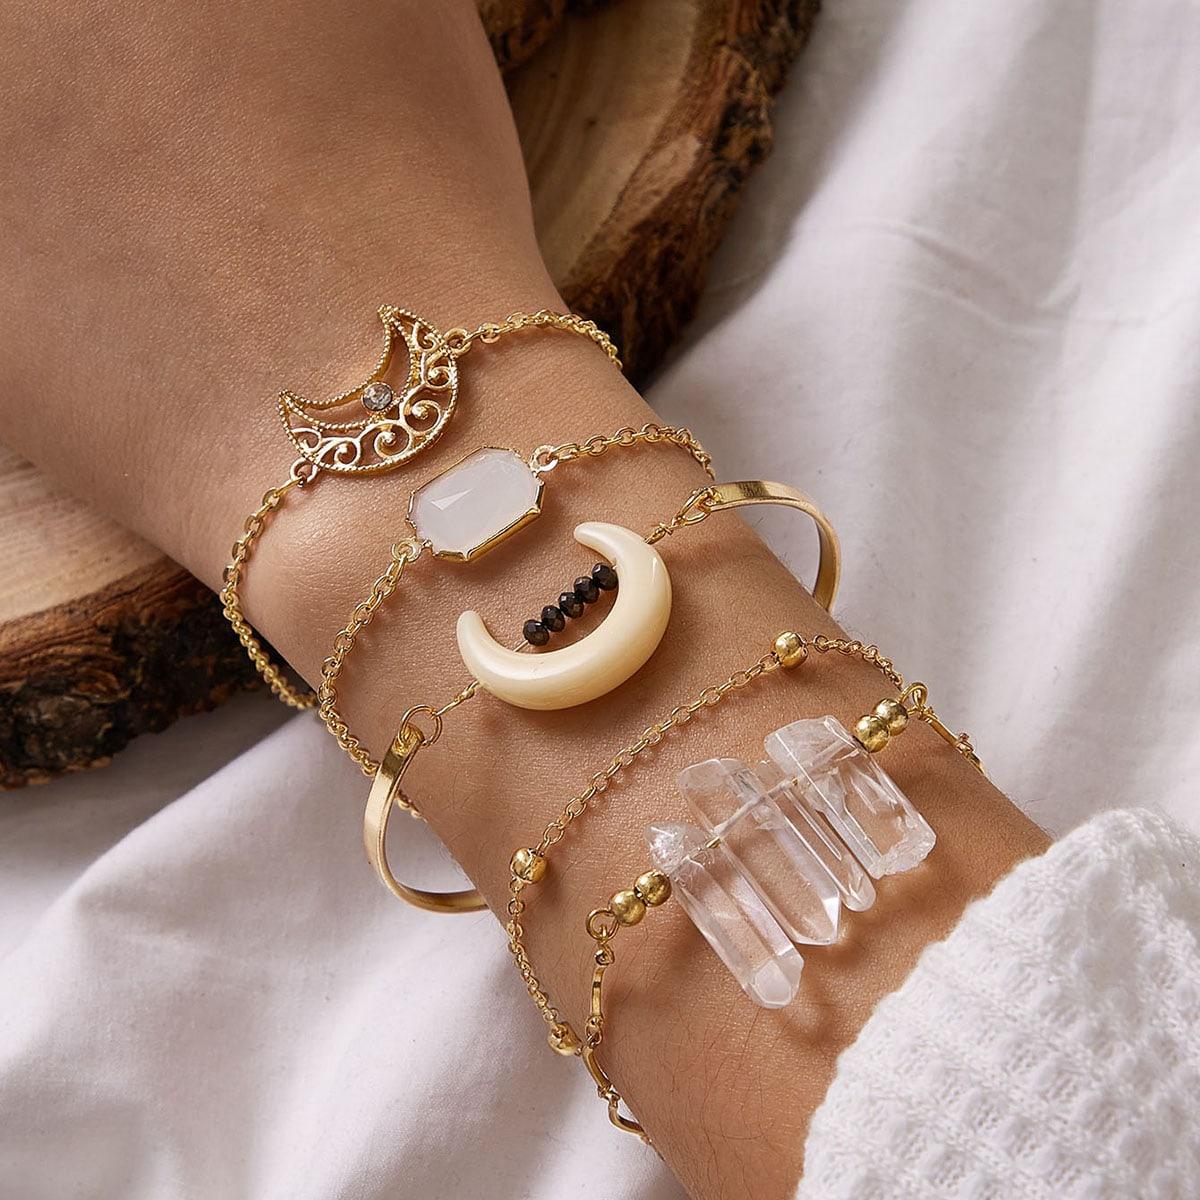 5pcs Mond & Stein Dekor Armband